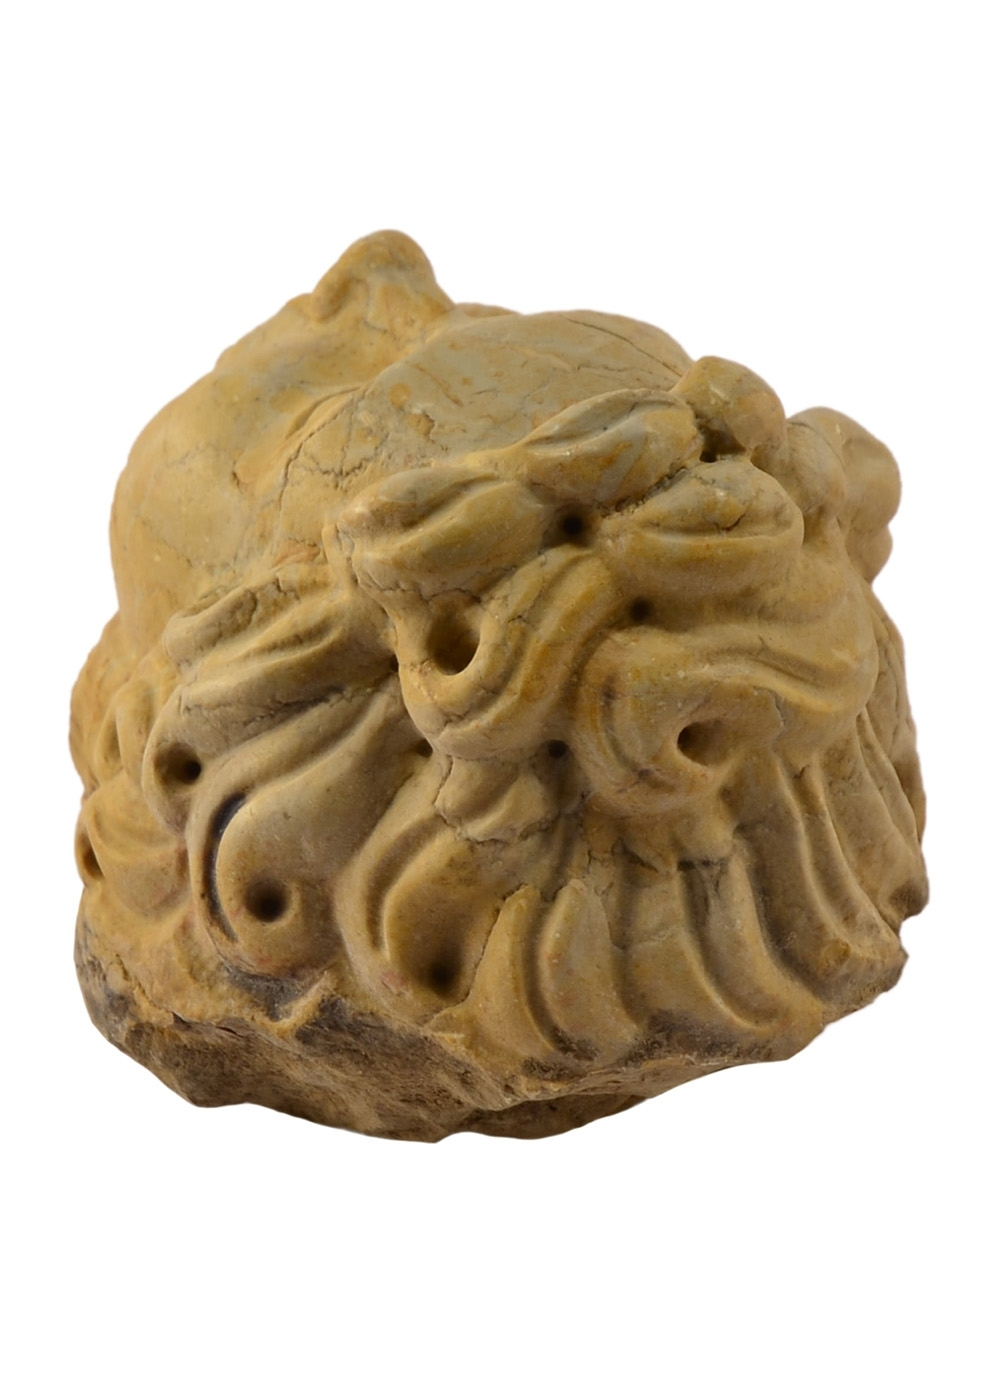 Buy Head Cherub Colored Marble Sculpture 17457742 | Italy2Us.com